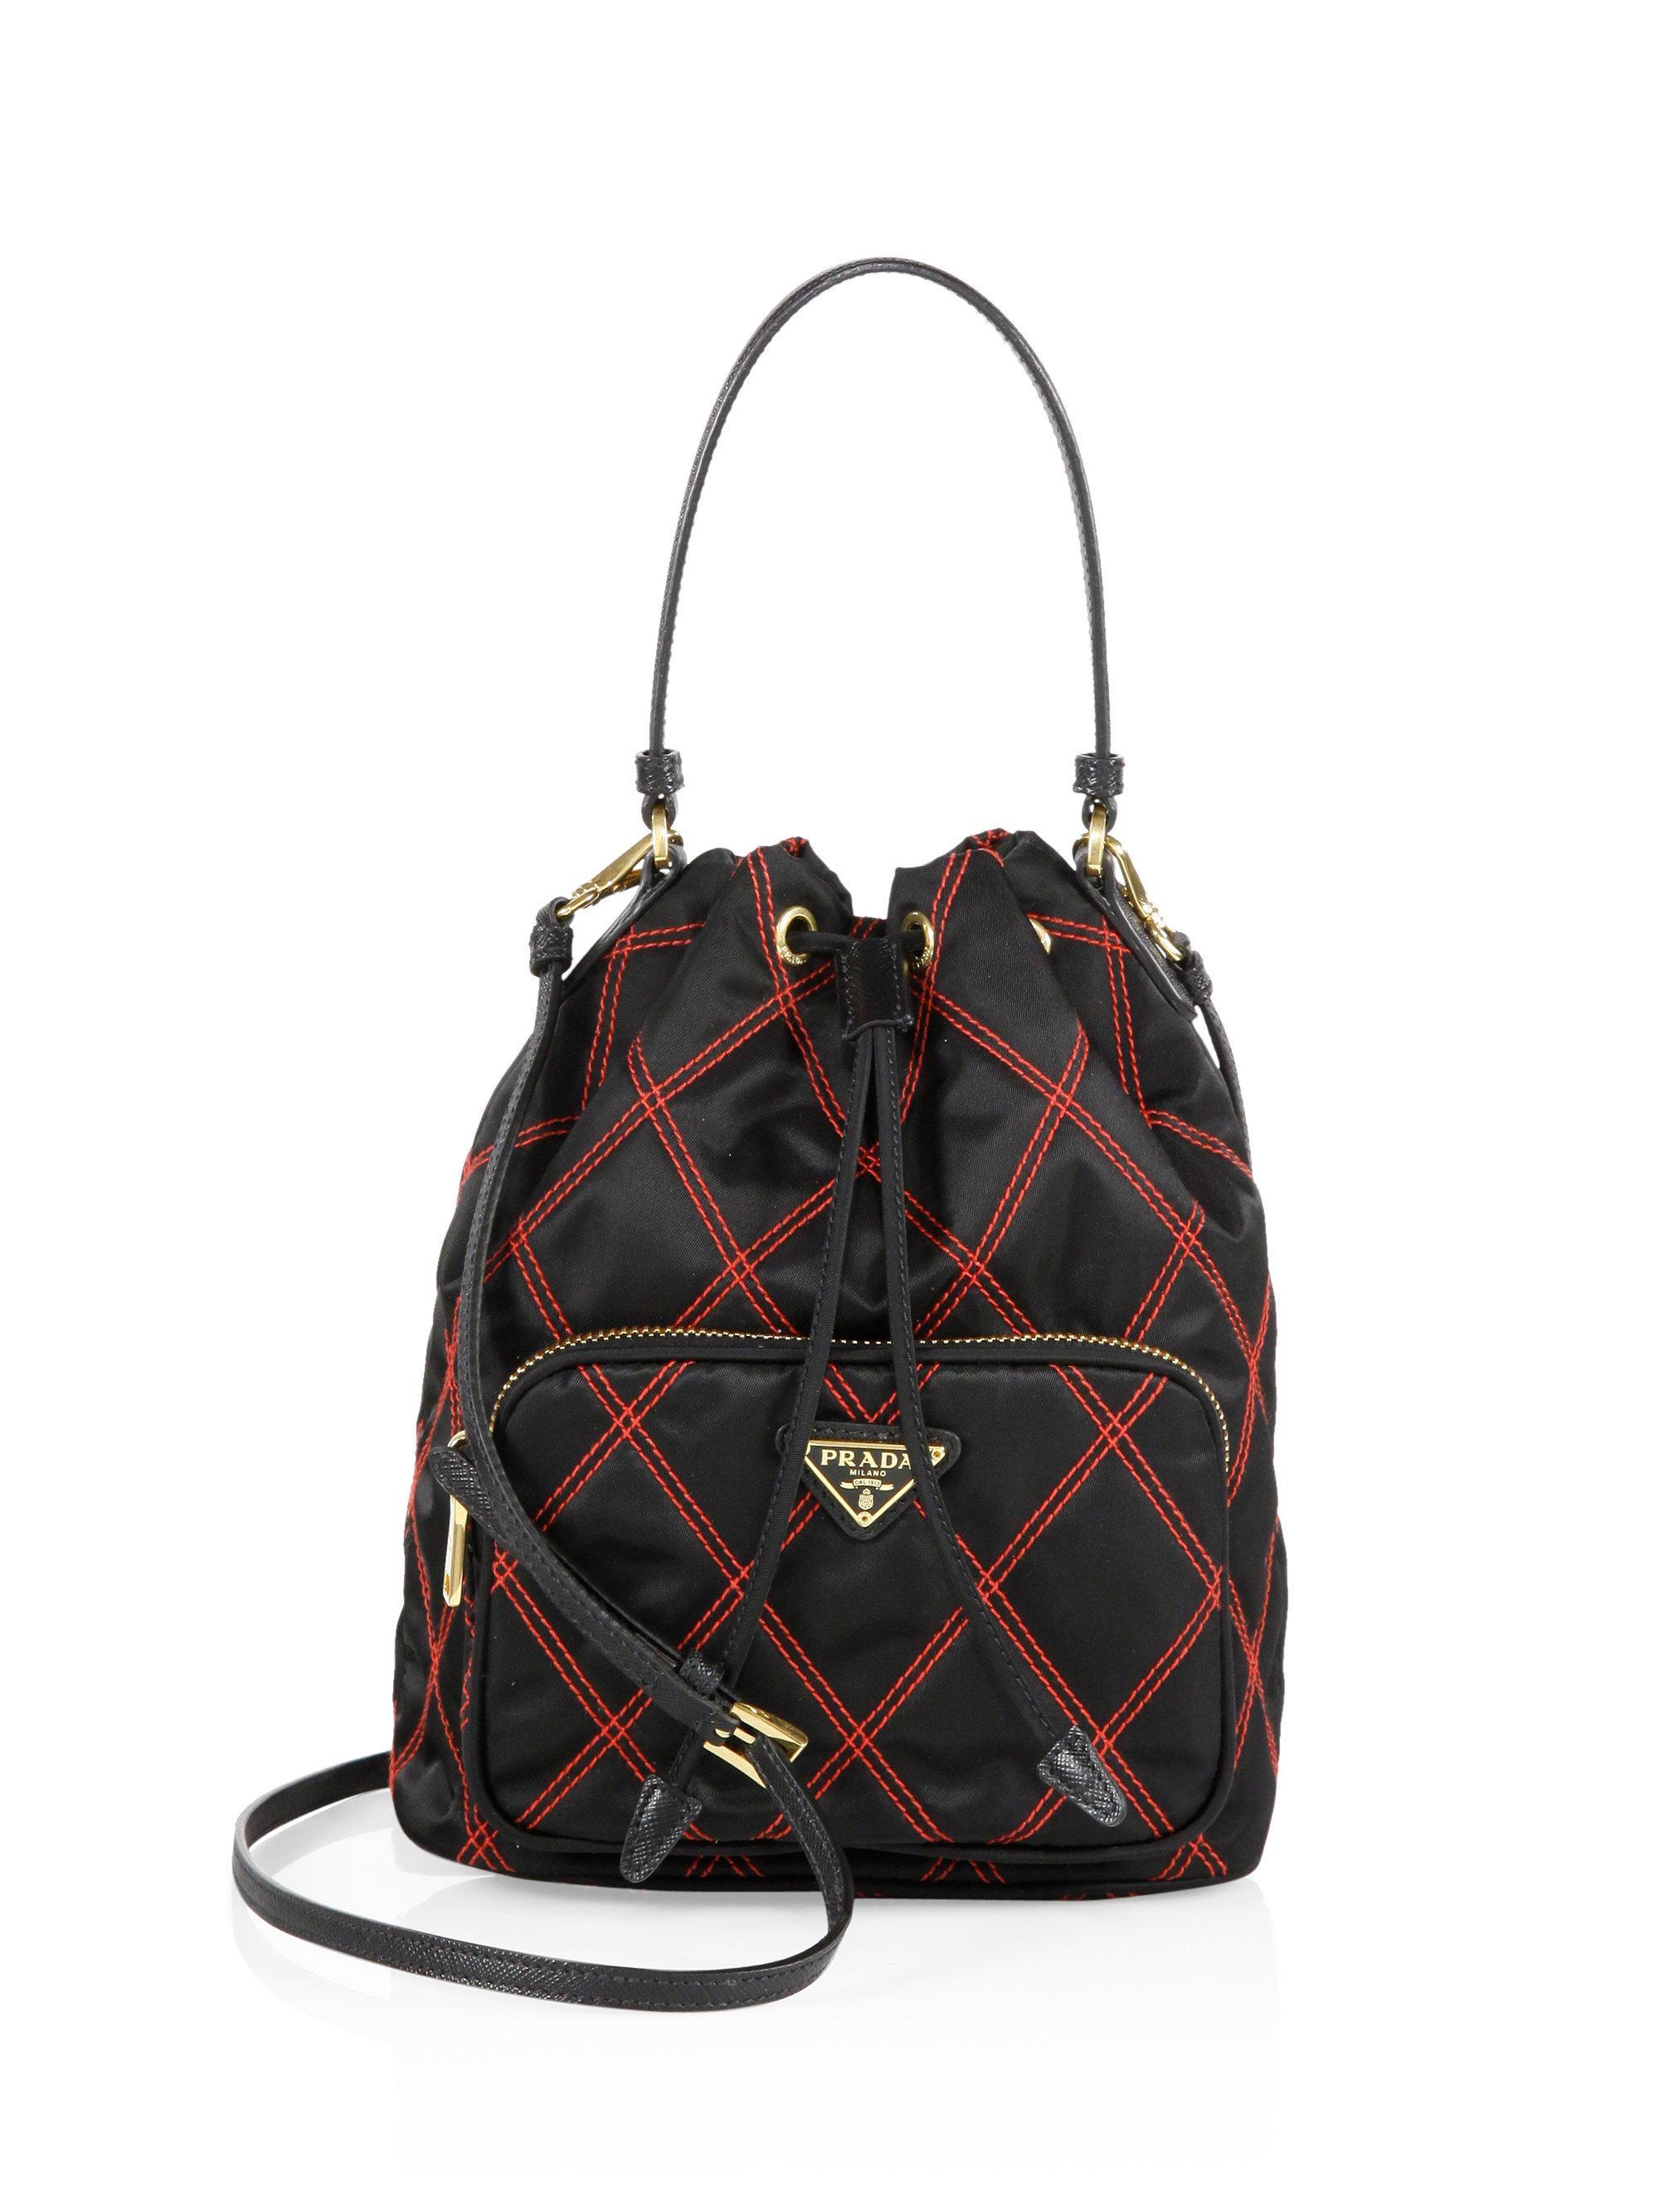 c4e2ddbe9846 Prada Tessuto Impunturato Quilted Nylon Bucket Bag in Black - Lyst